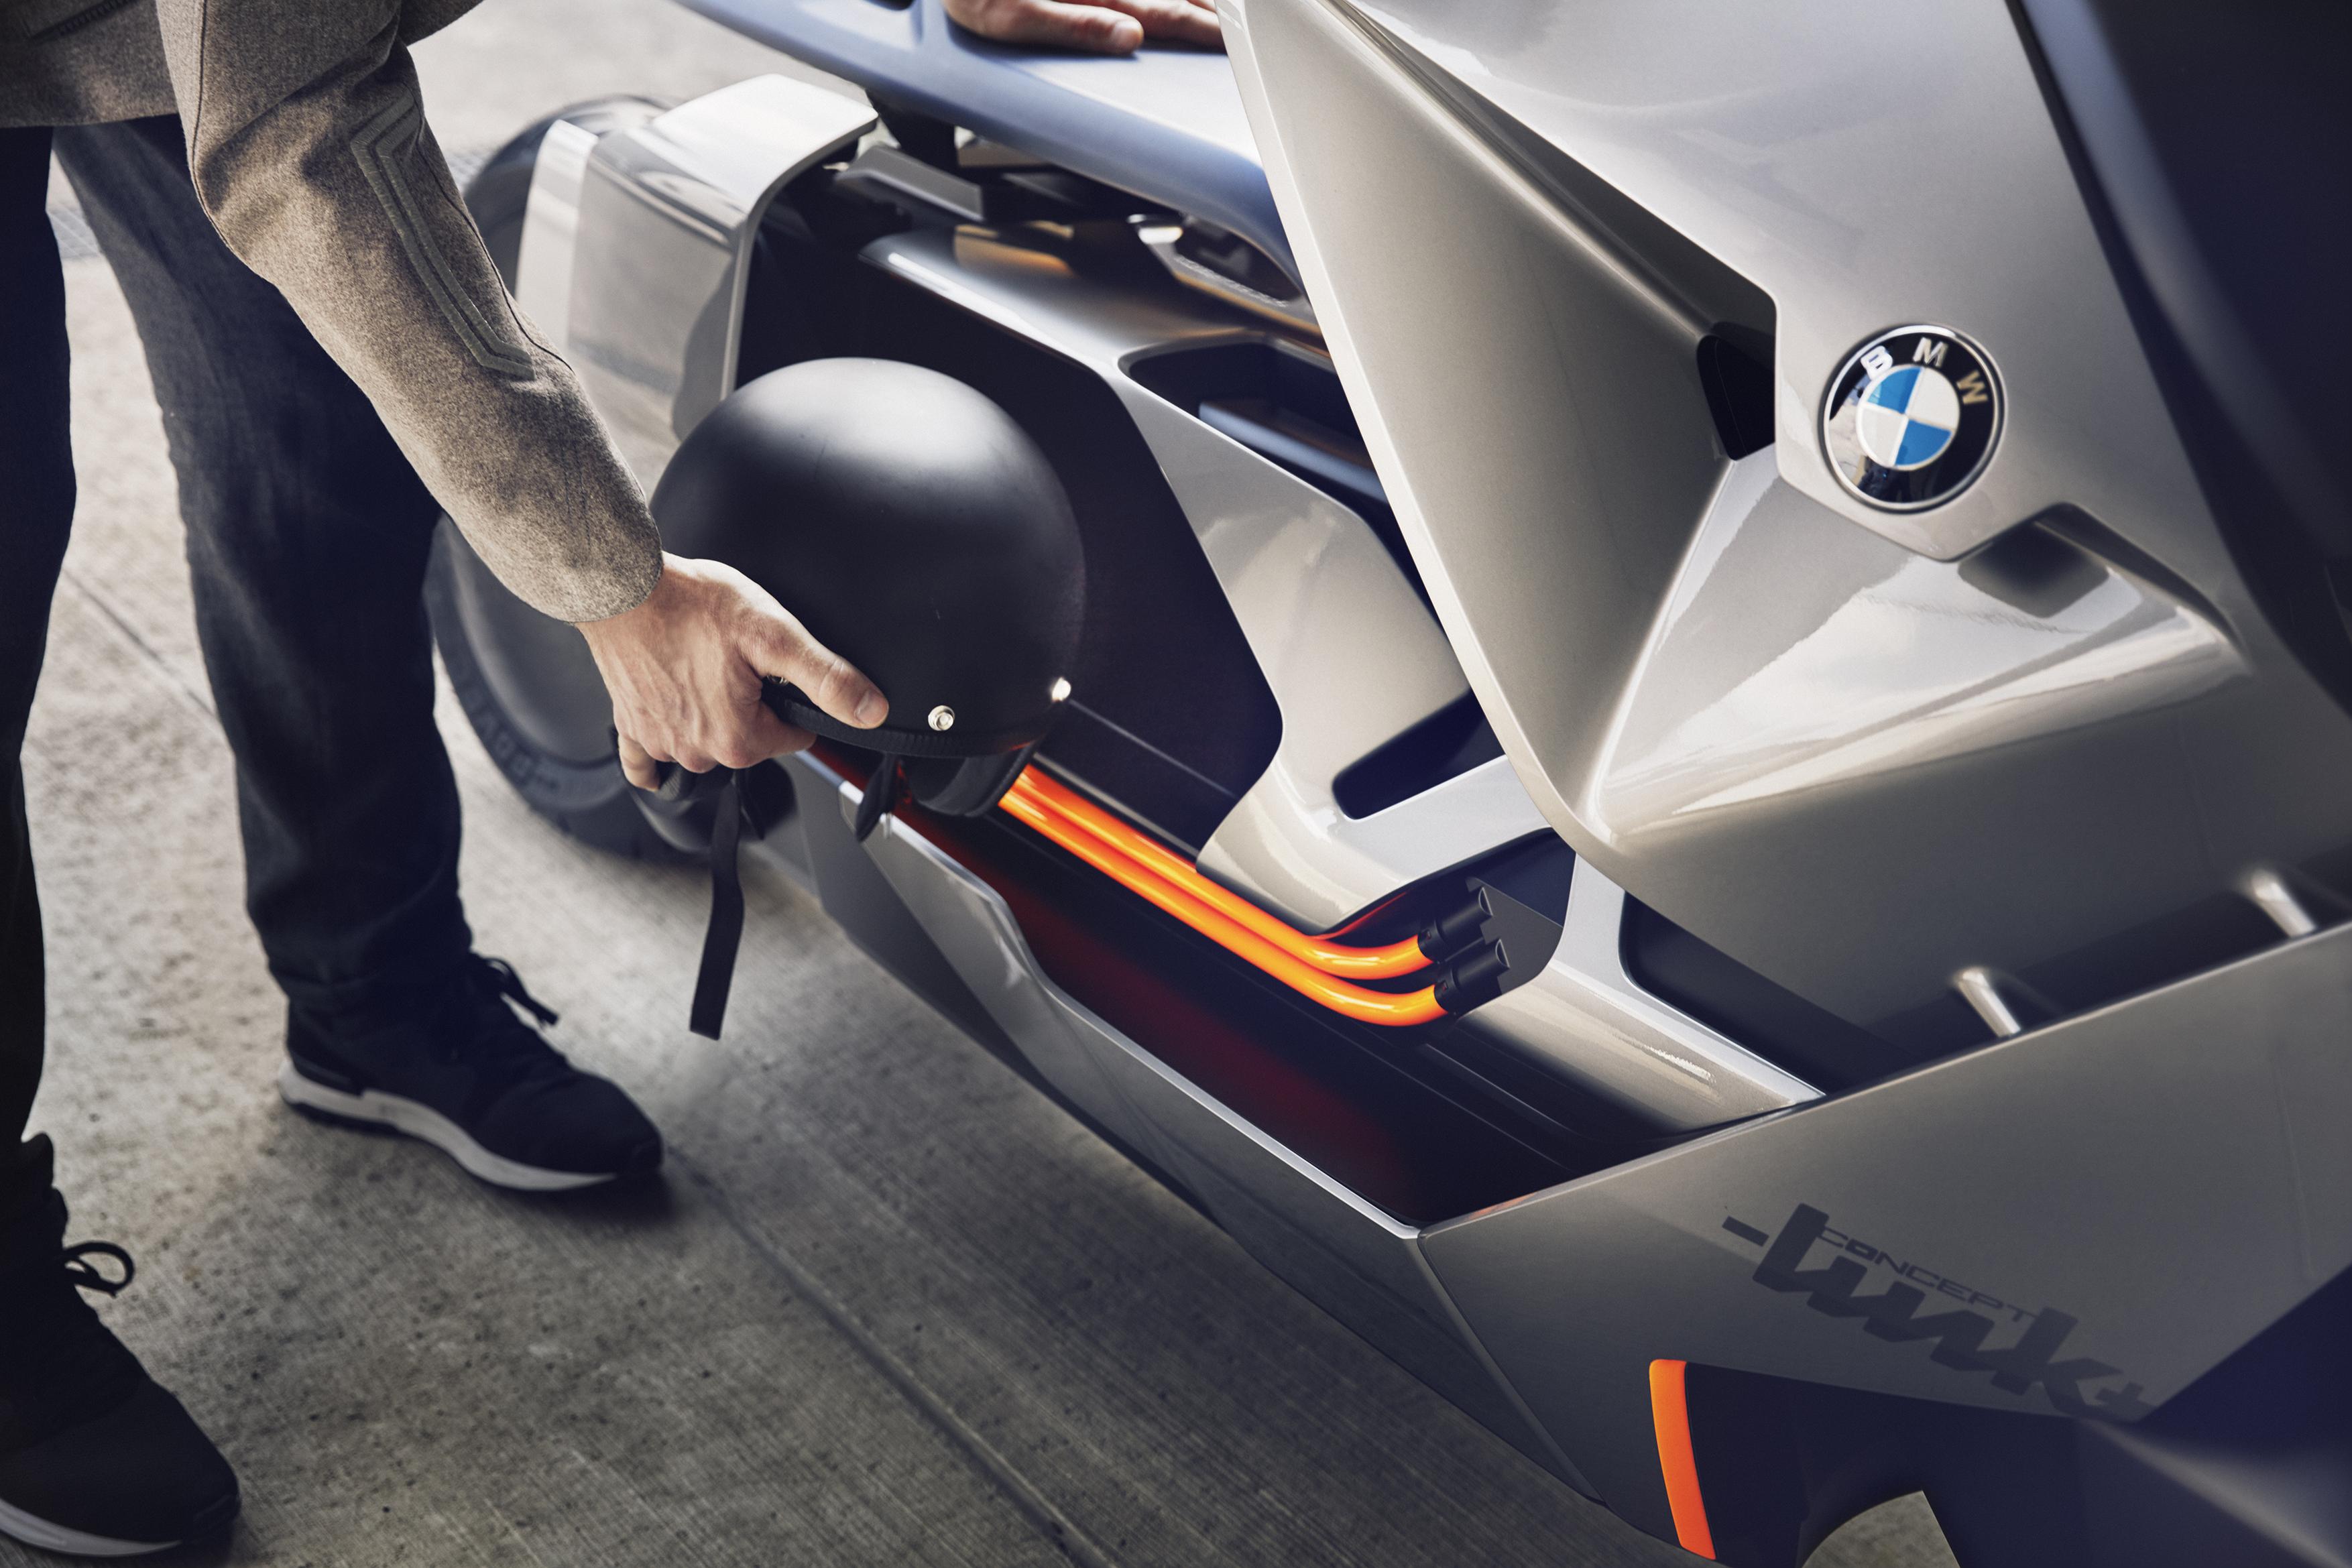 Bmw S New Concept Motorcycle Looks Like It Belongs In